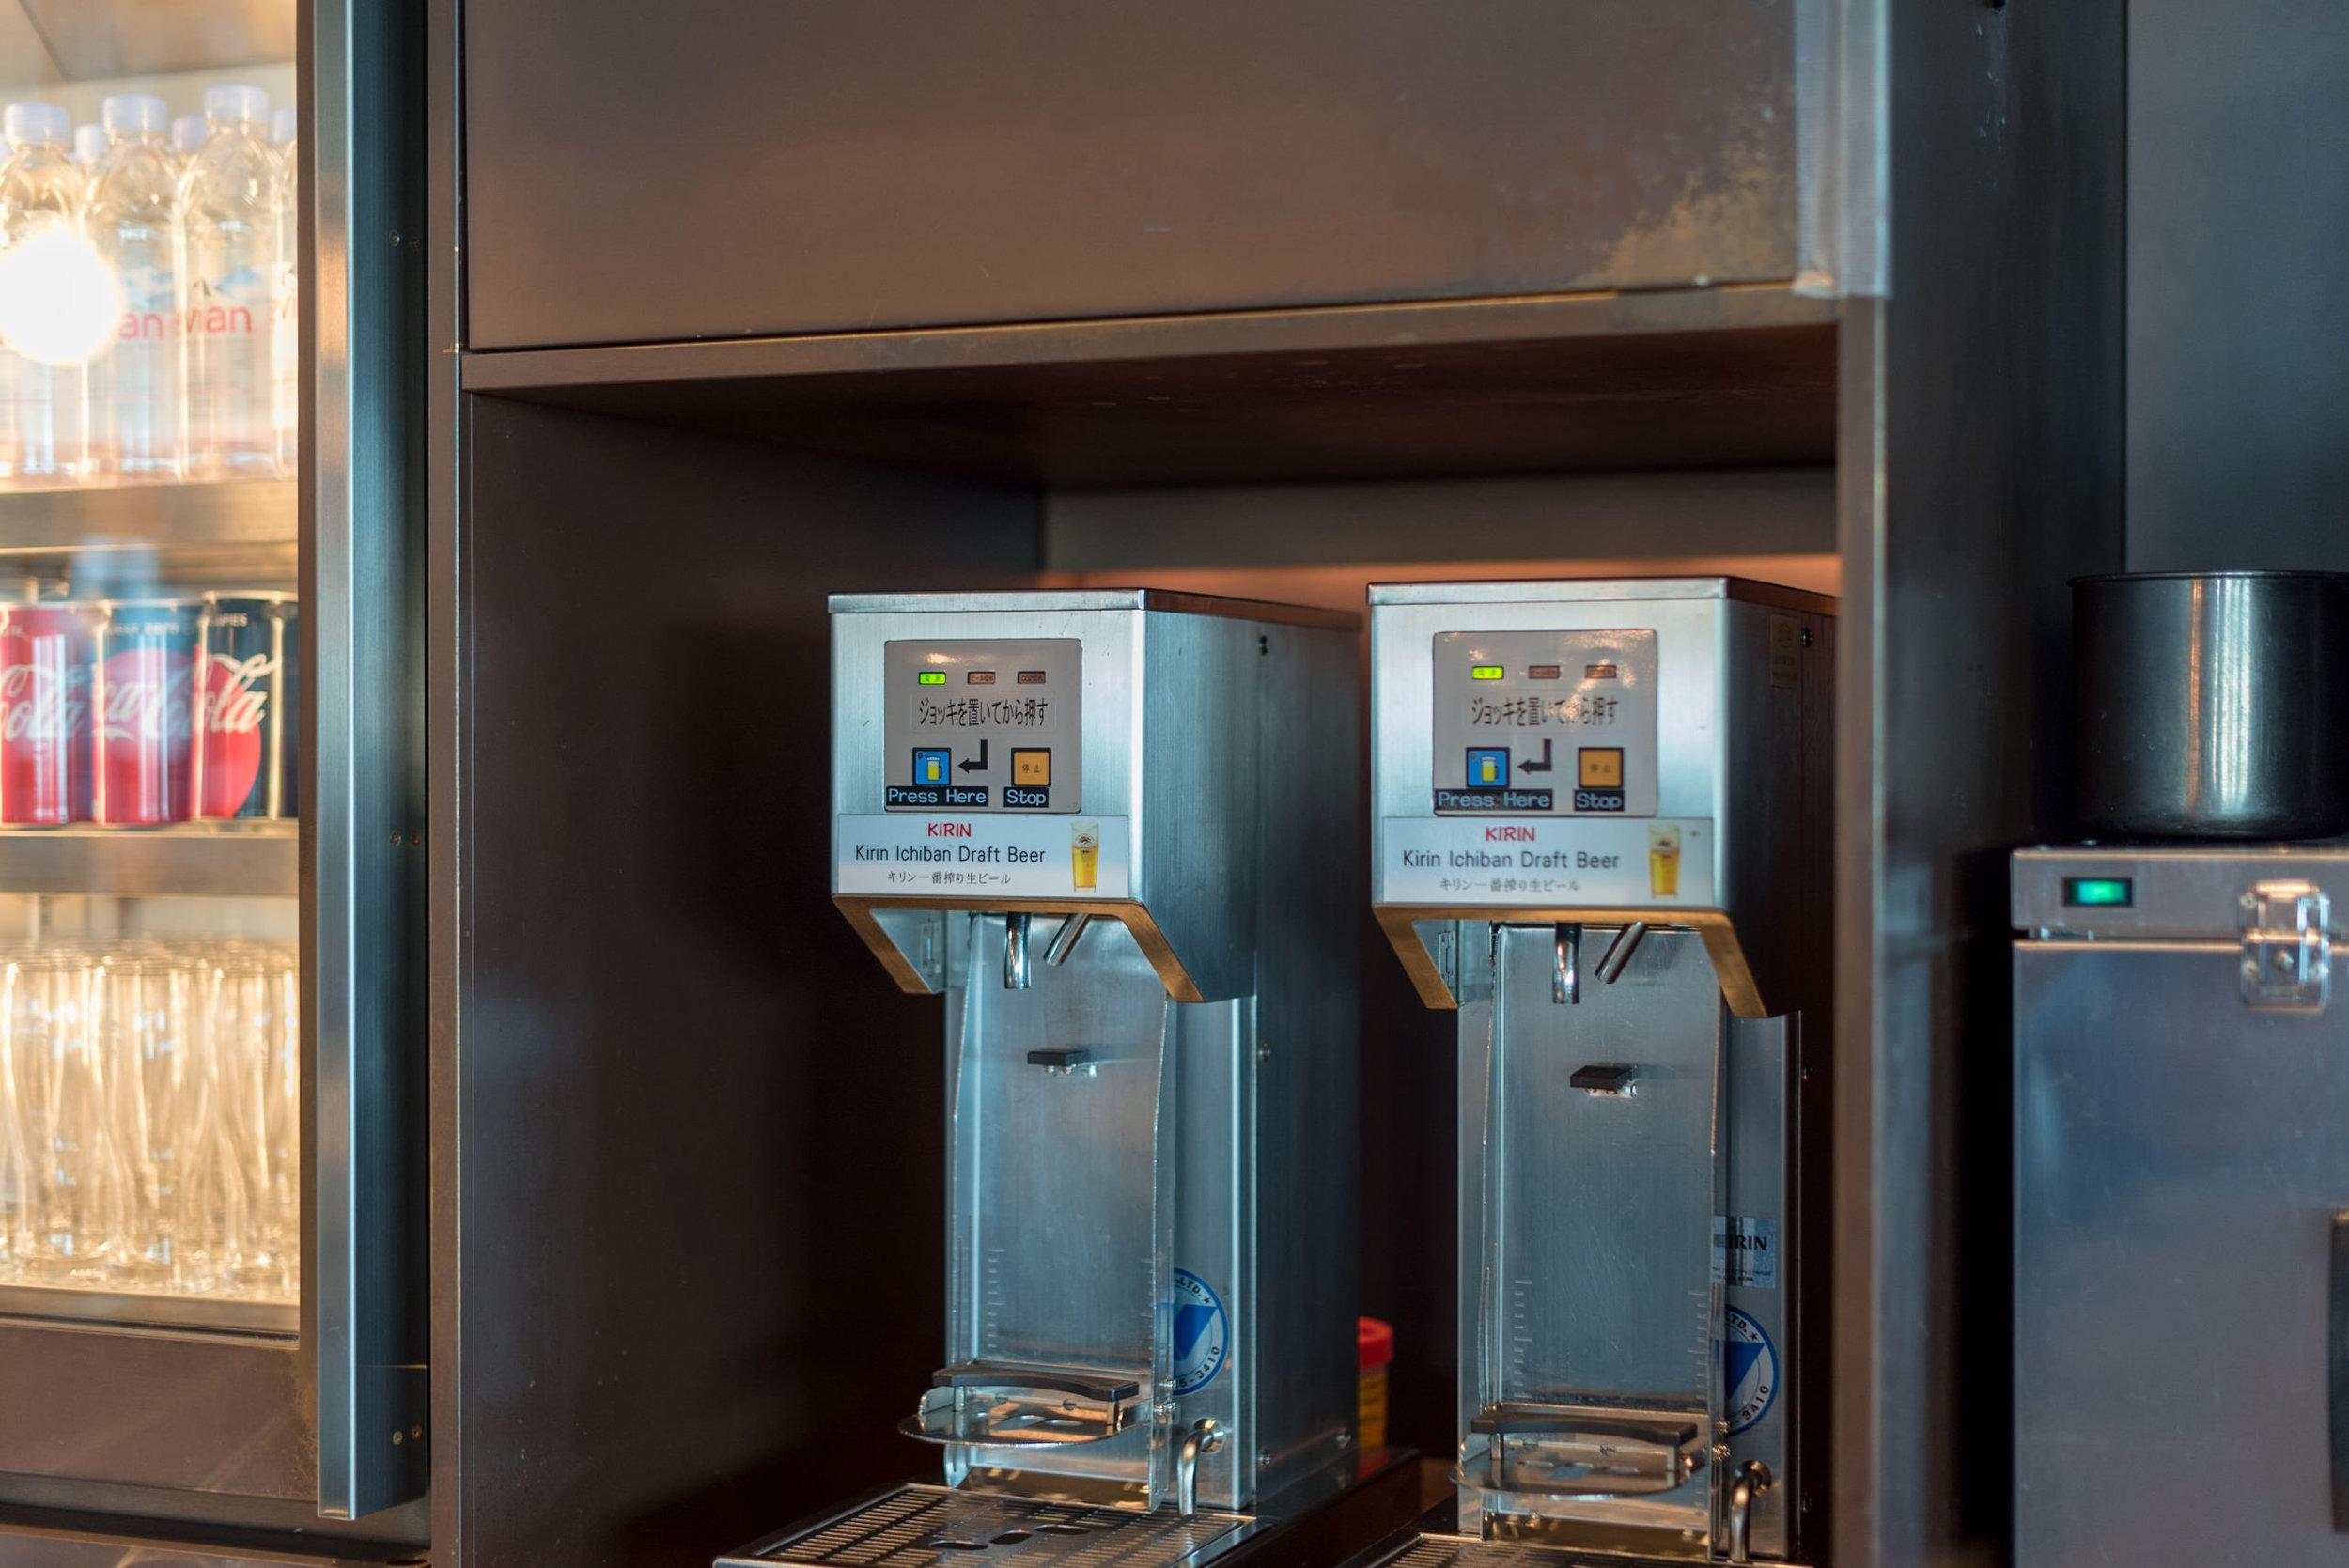 Kirin Ichiban Draft Beer Dispenser  Cathay Pacific Lounge - Haneda Airport (HND)